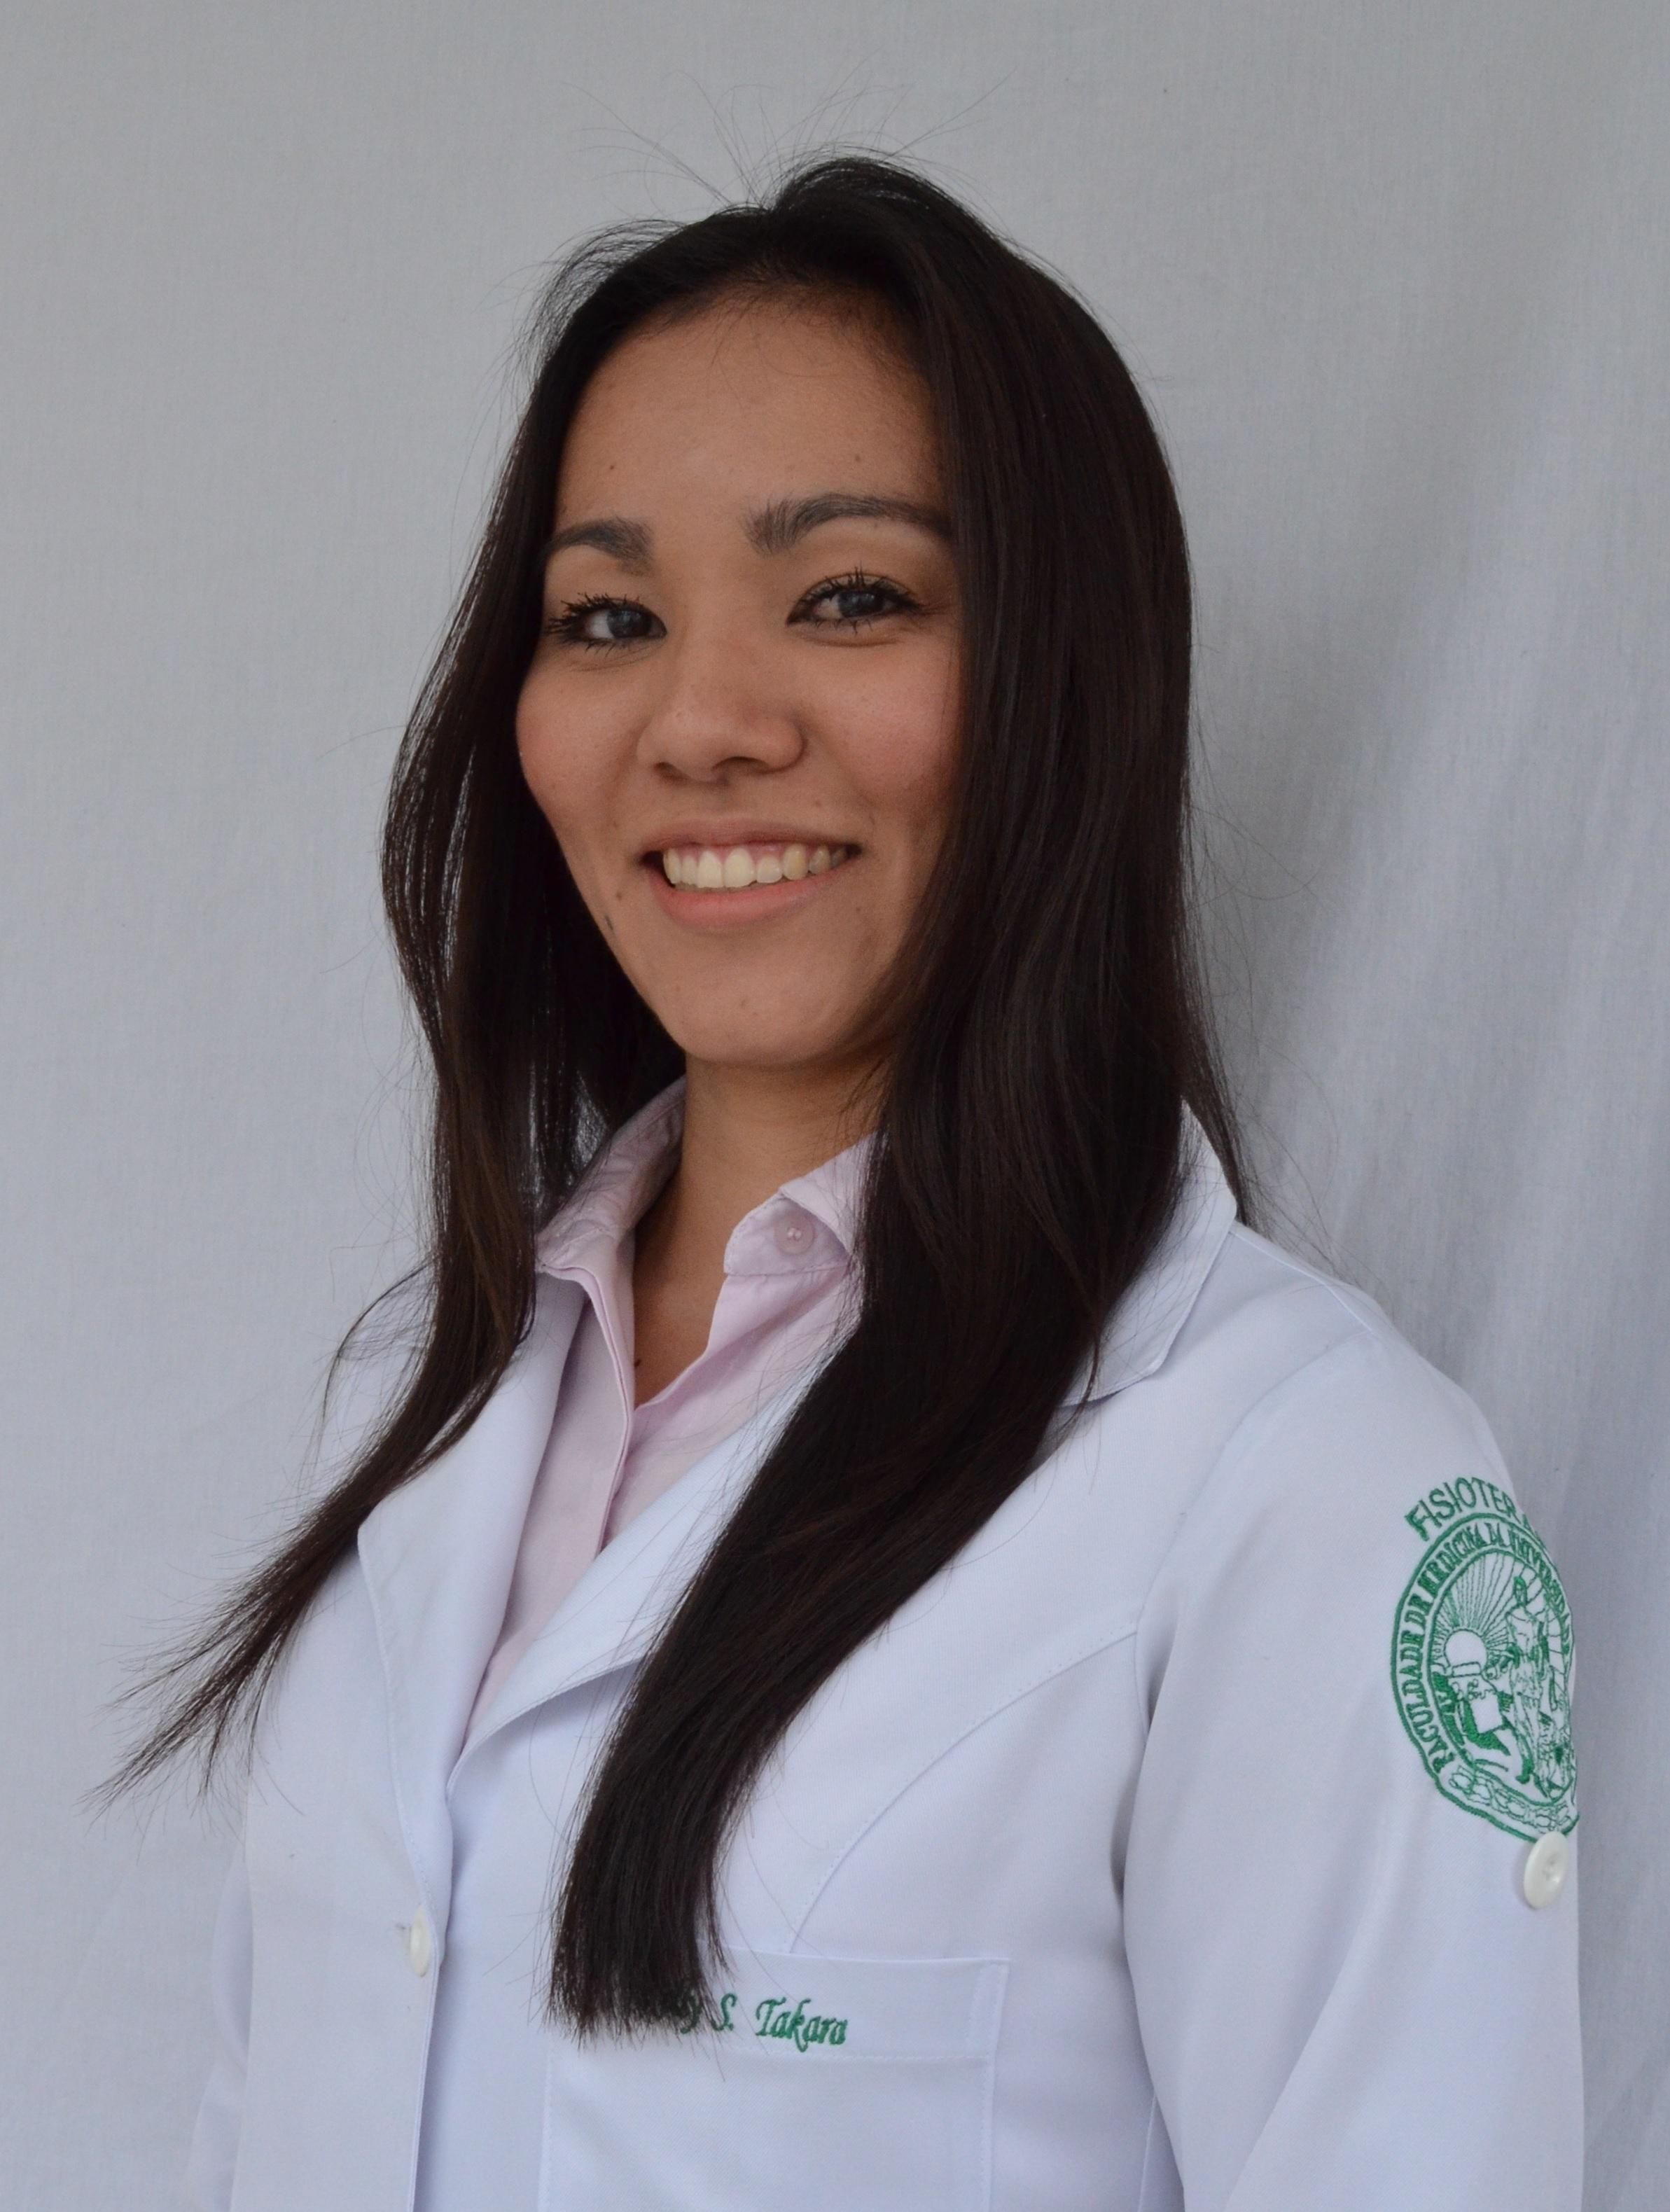 Dr. Kelly S. Takara